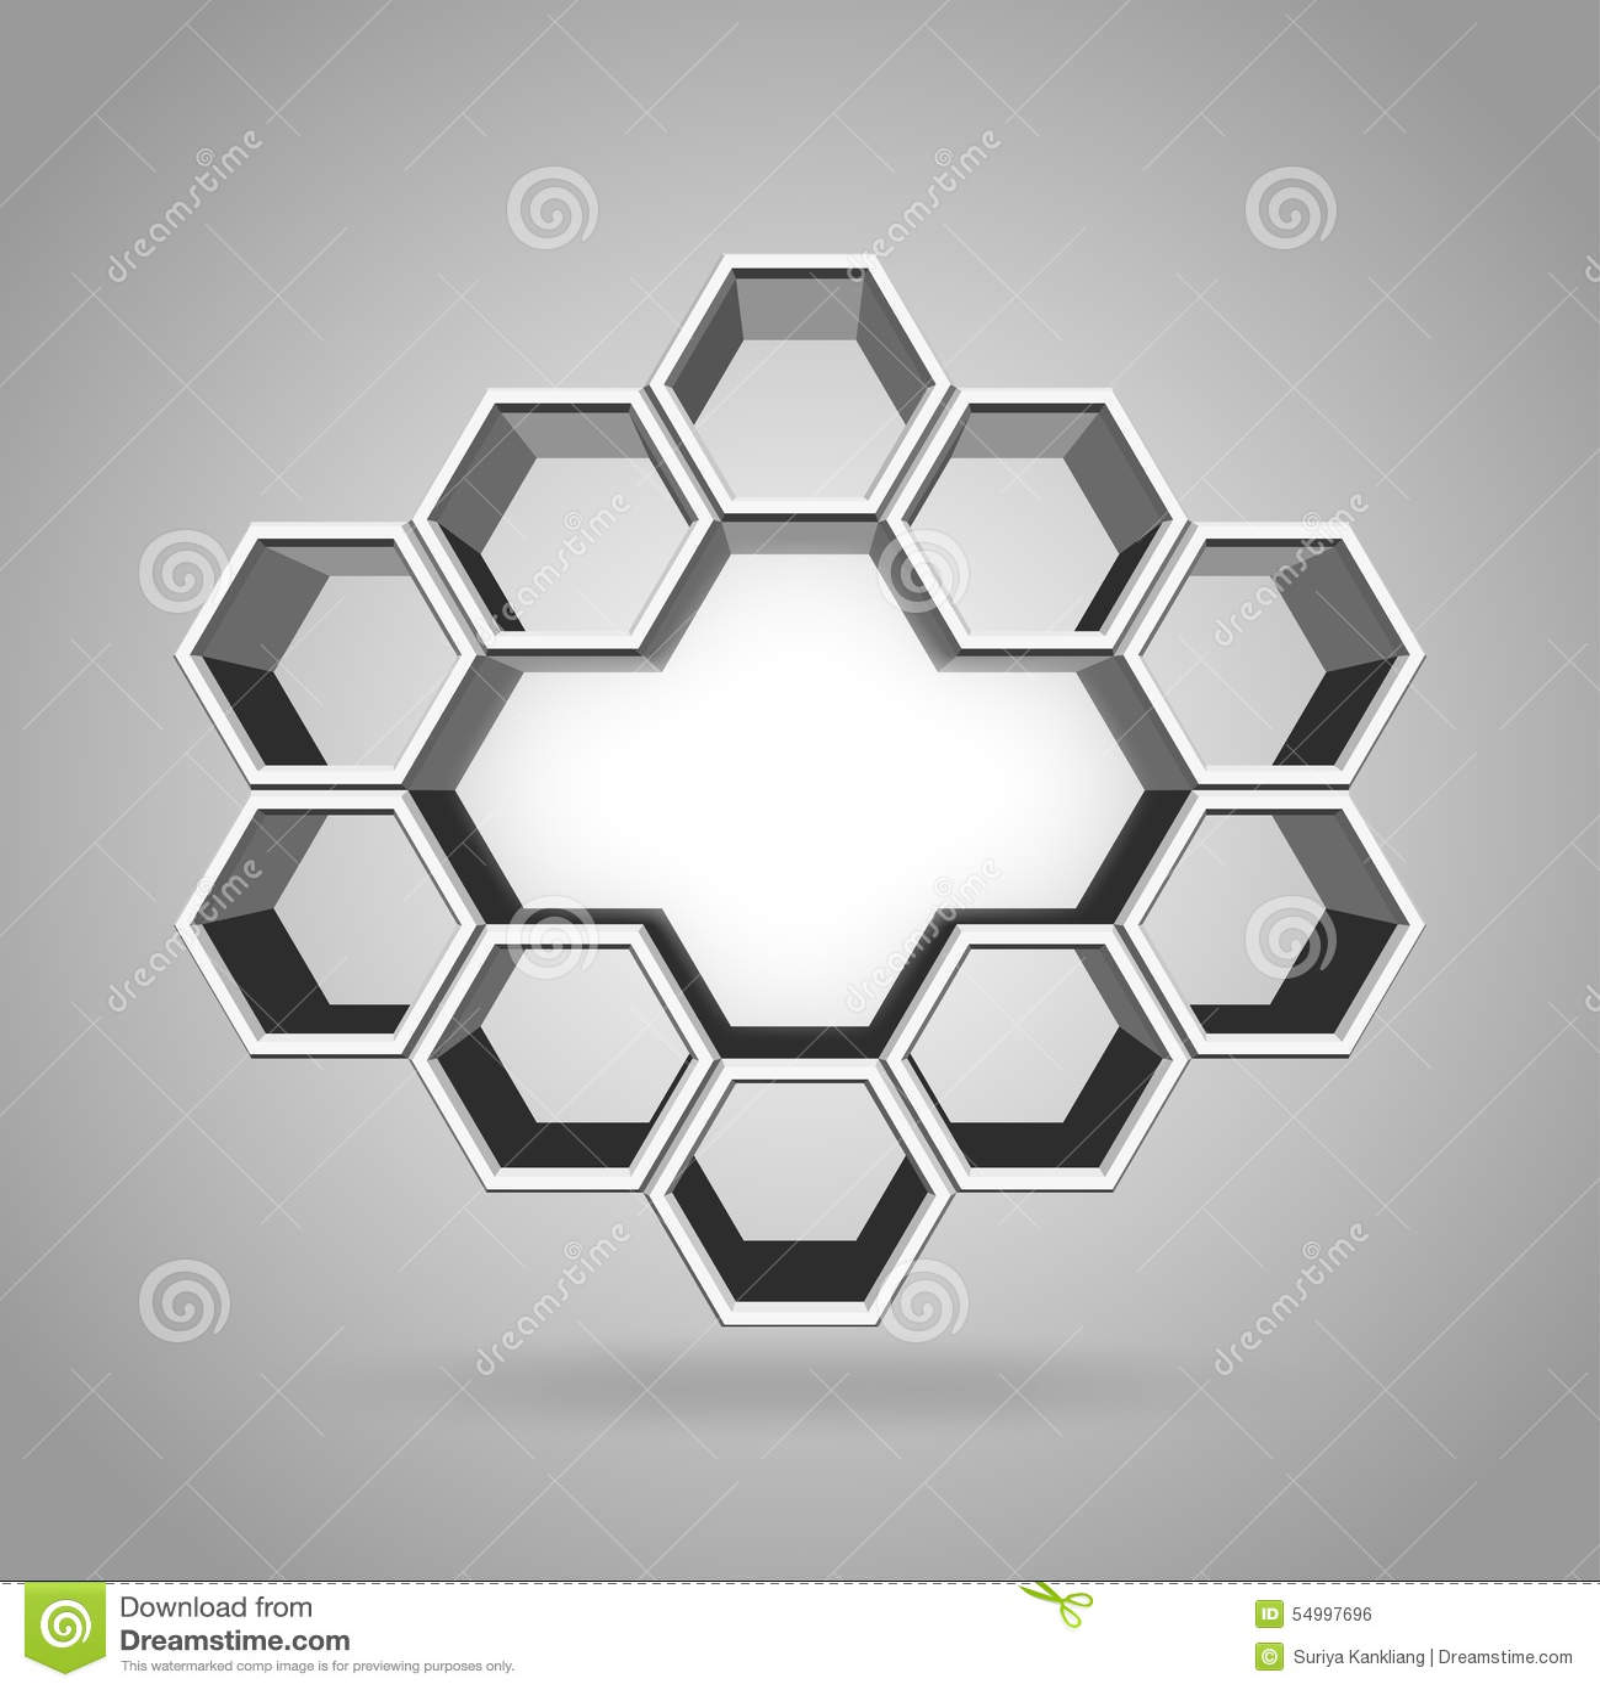 3d hexagon pattern stock vector image 54997696 - Royalty Free Vector Hexagon Pattern